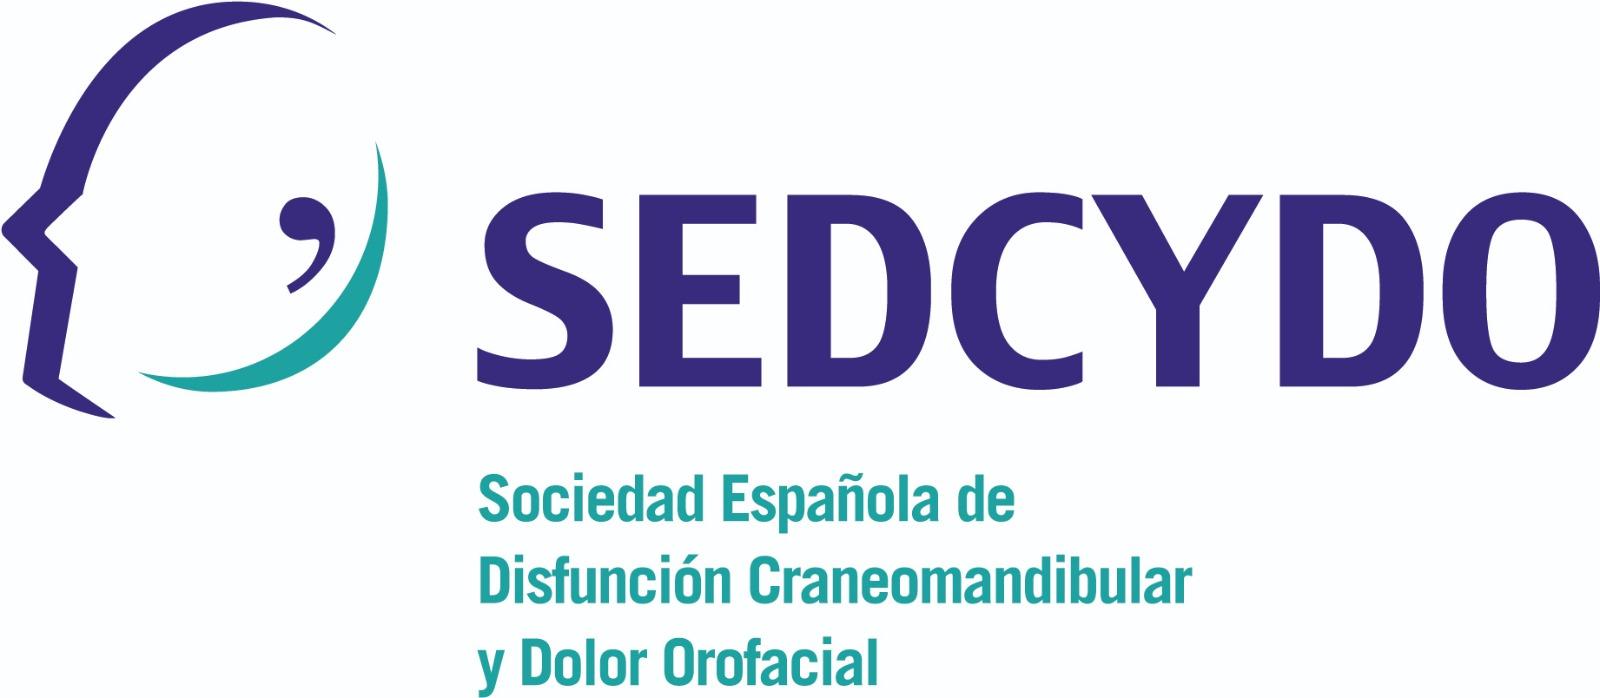 Webinario Ozonoterapia periodoncia avalado por SEDCYDO